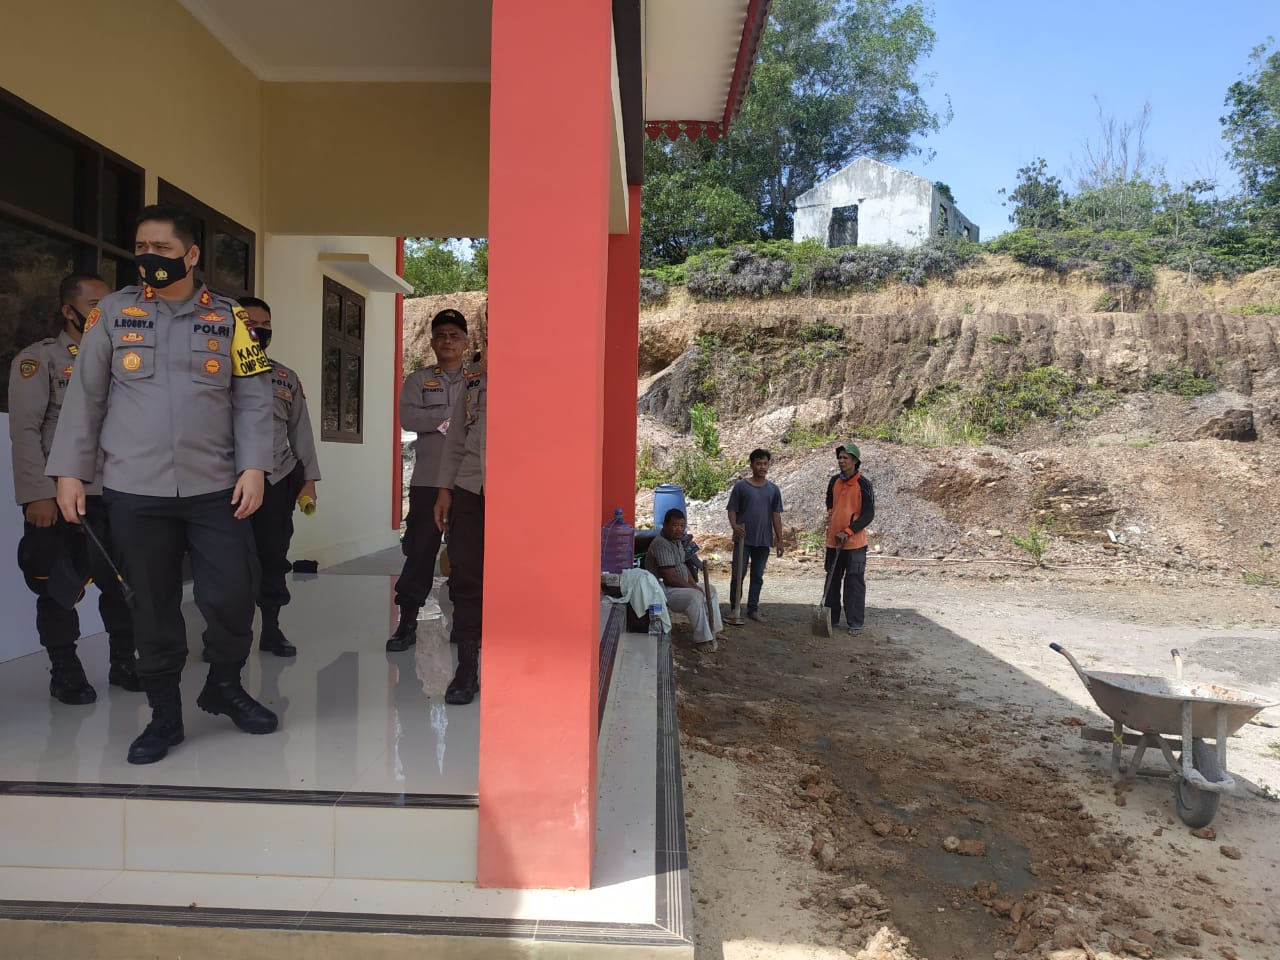 Kapolres Lingga Mengunjungi dan Mengecek Mako Sat Pol Airud Polres Lingga